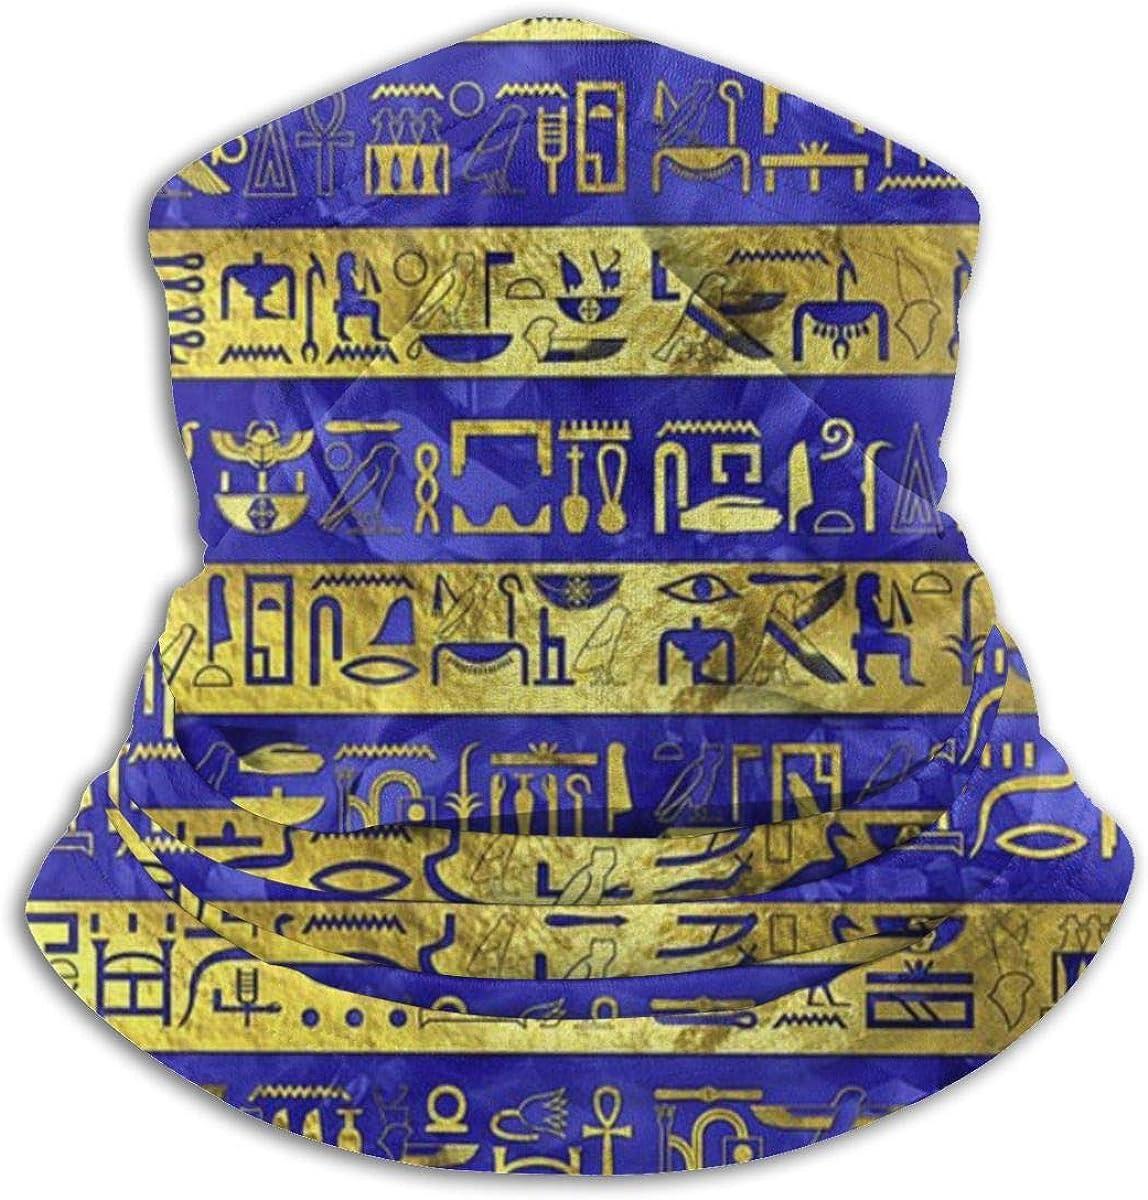 CLERO& Scarf Fleece Neck Warmer Golden Purple Egyptian Egypt Hieroglyphs Windproof Outdoor Headwear Comfortable Neck Gaiter Warmer Face Mask for Cold Weather Winter Outdoor Sports